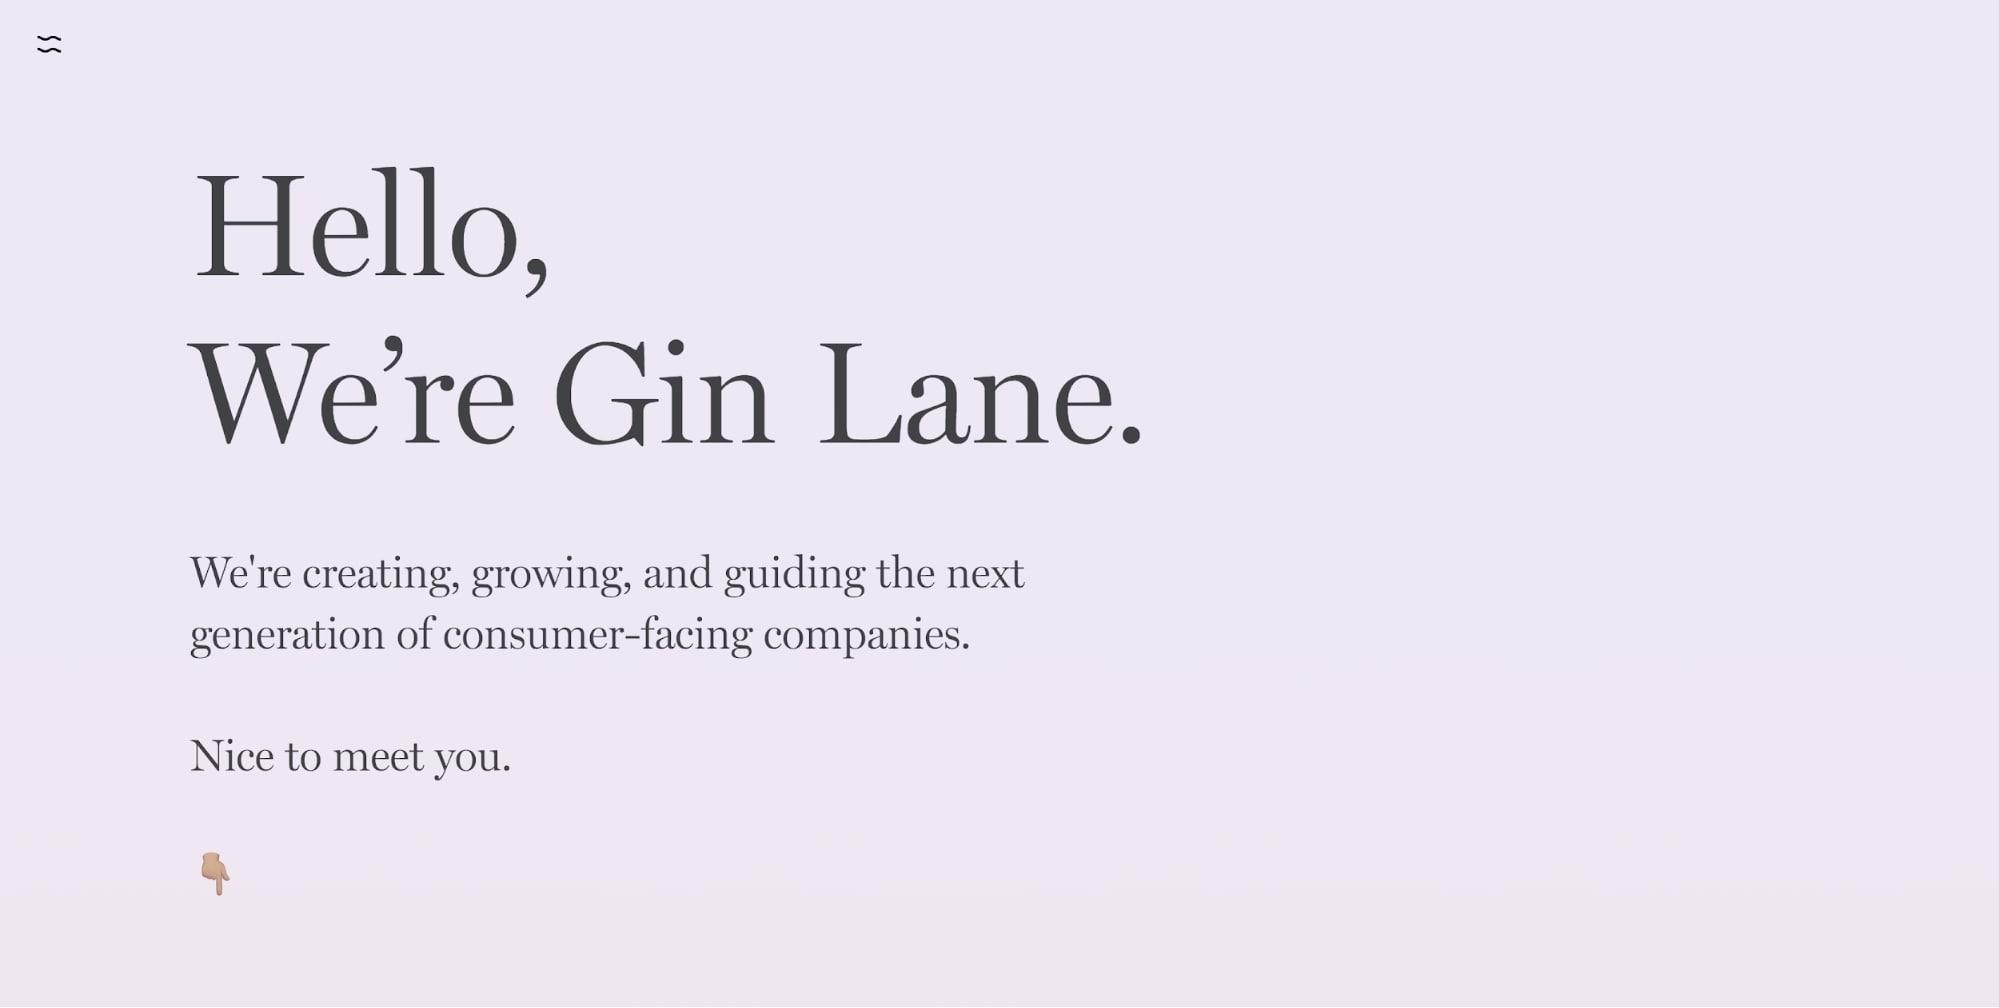 Gin Lane's website